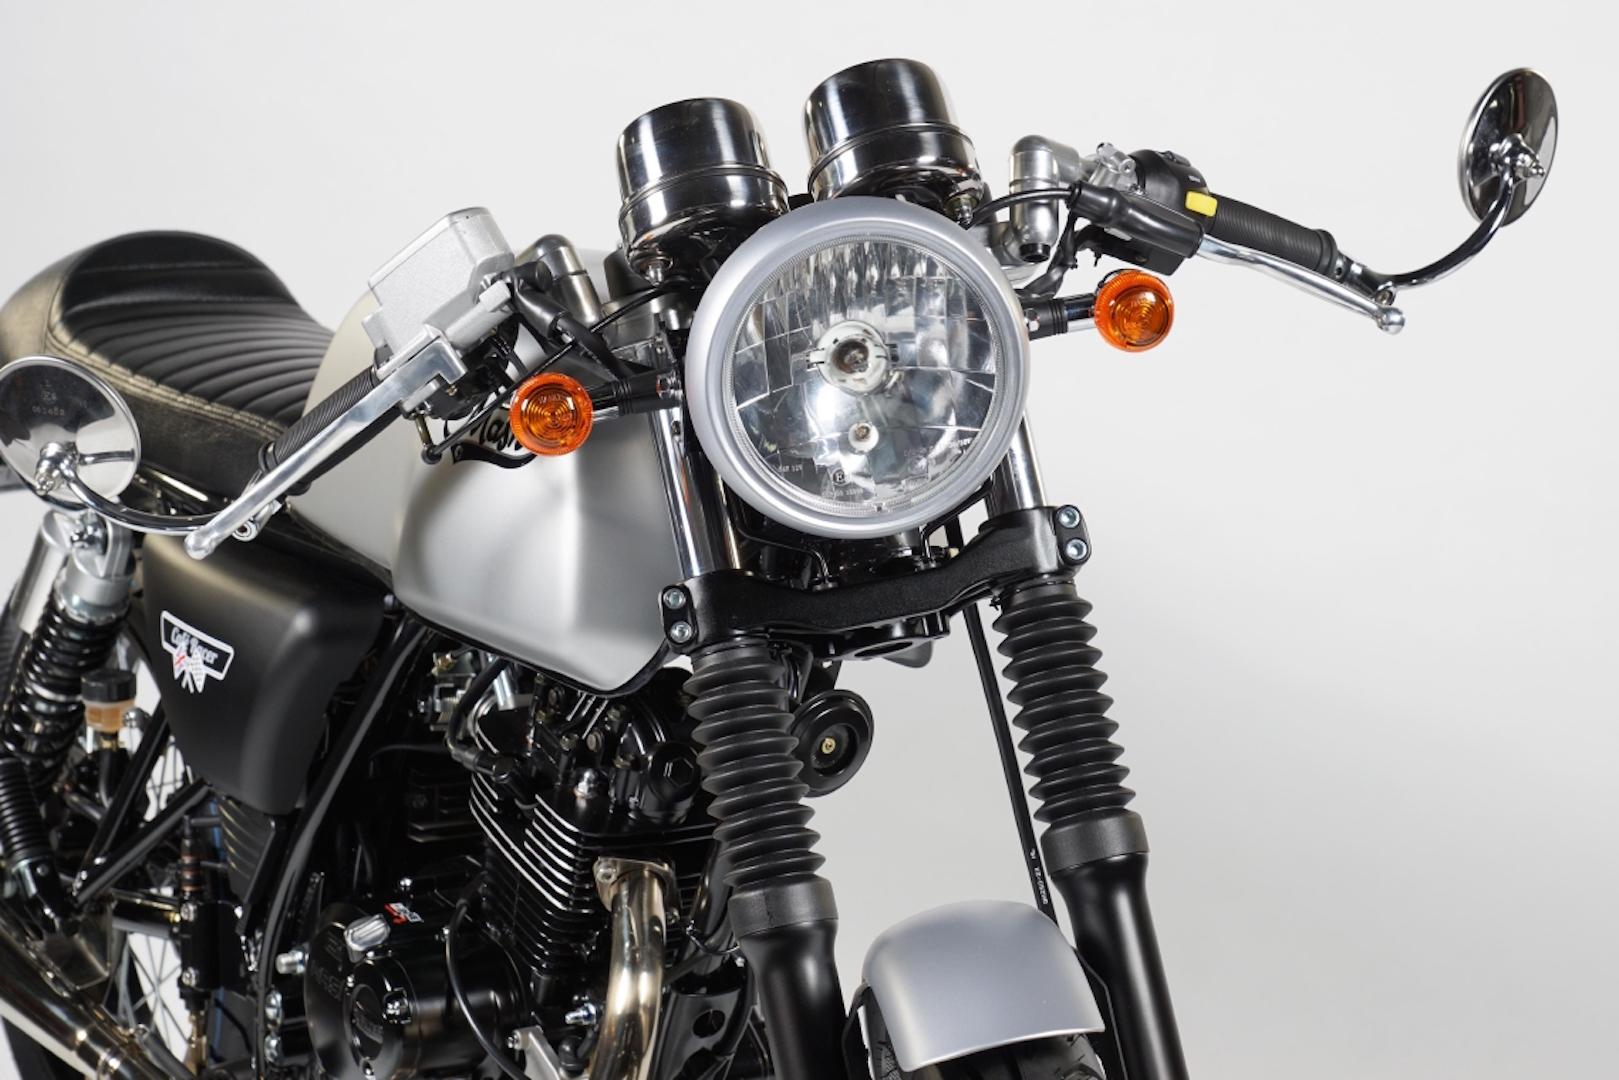 2018 Mash Cafe Racer 125cc Martin Roberts Motorcycles